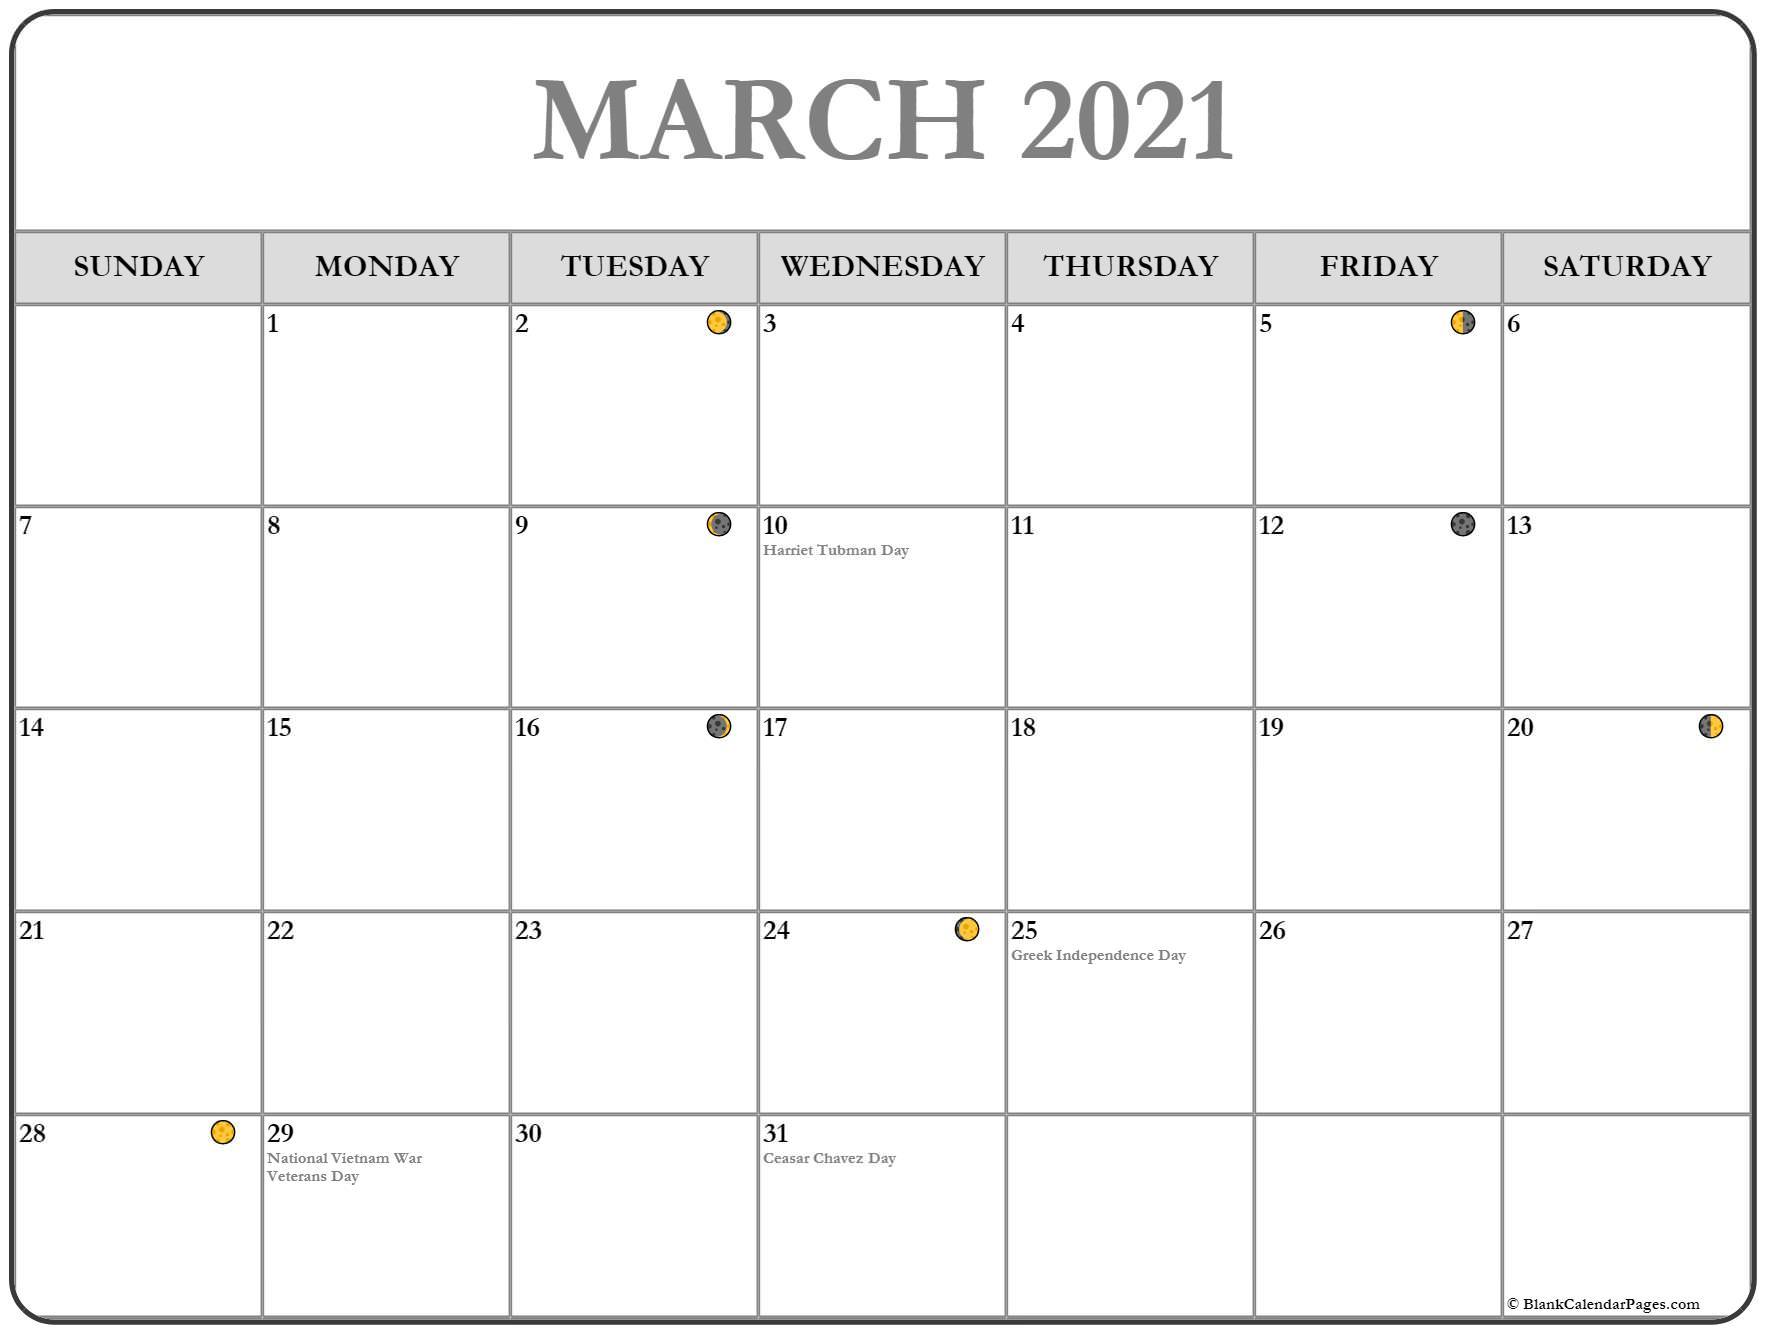 March 2021 Lunar Calendar